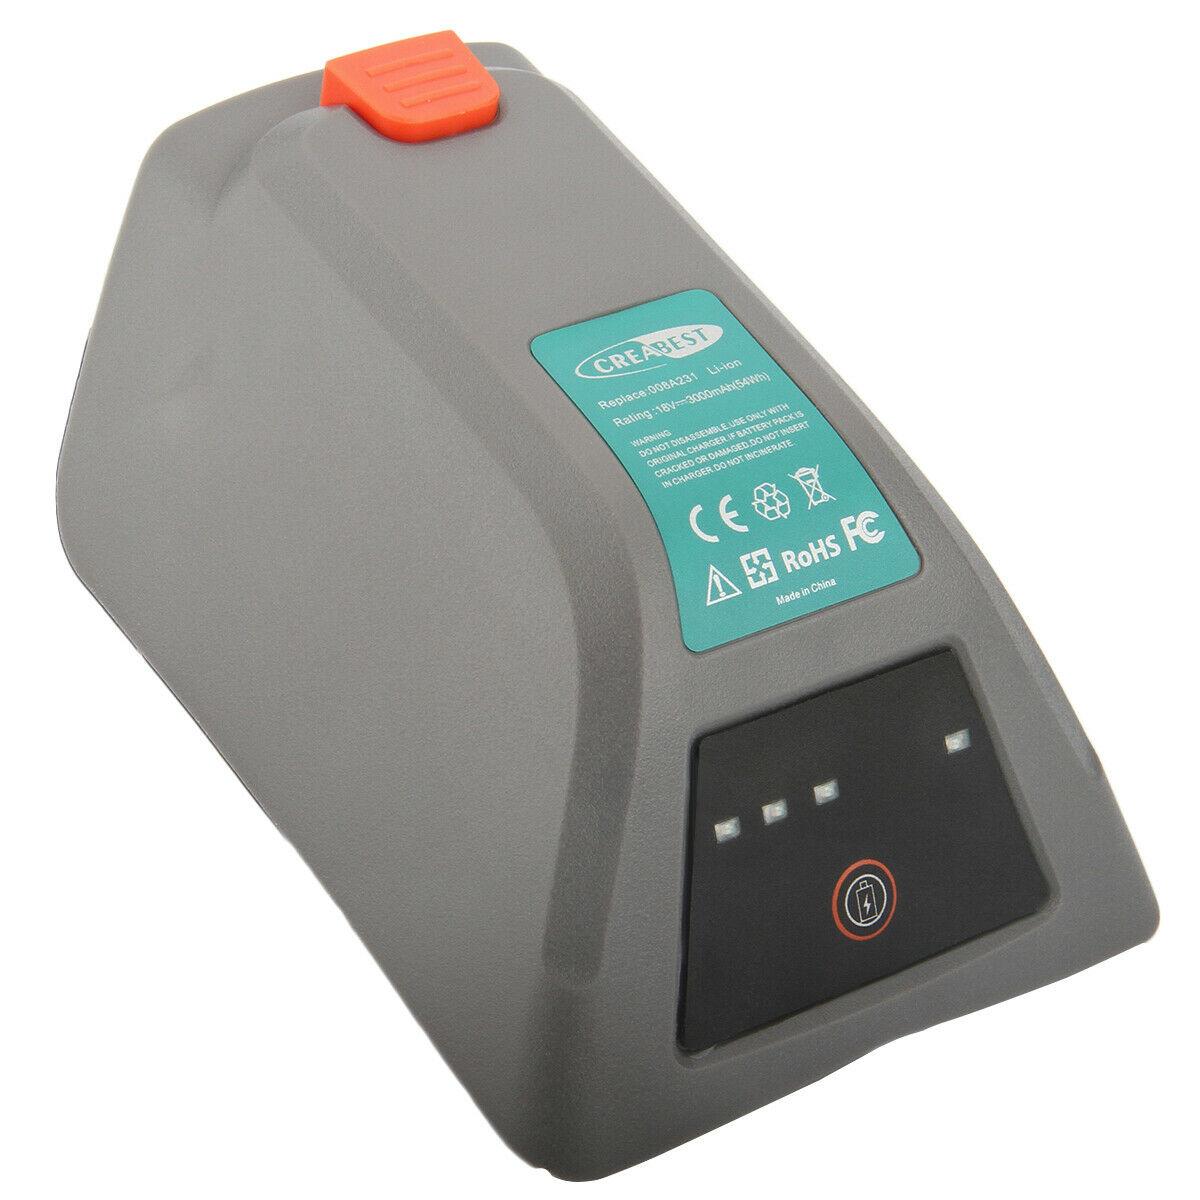 akku für Gardena 8025-20 Comfort Wand-Schlauchbox 35 roll-up 18v 3000mah li-Ion (kompatibel)